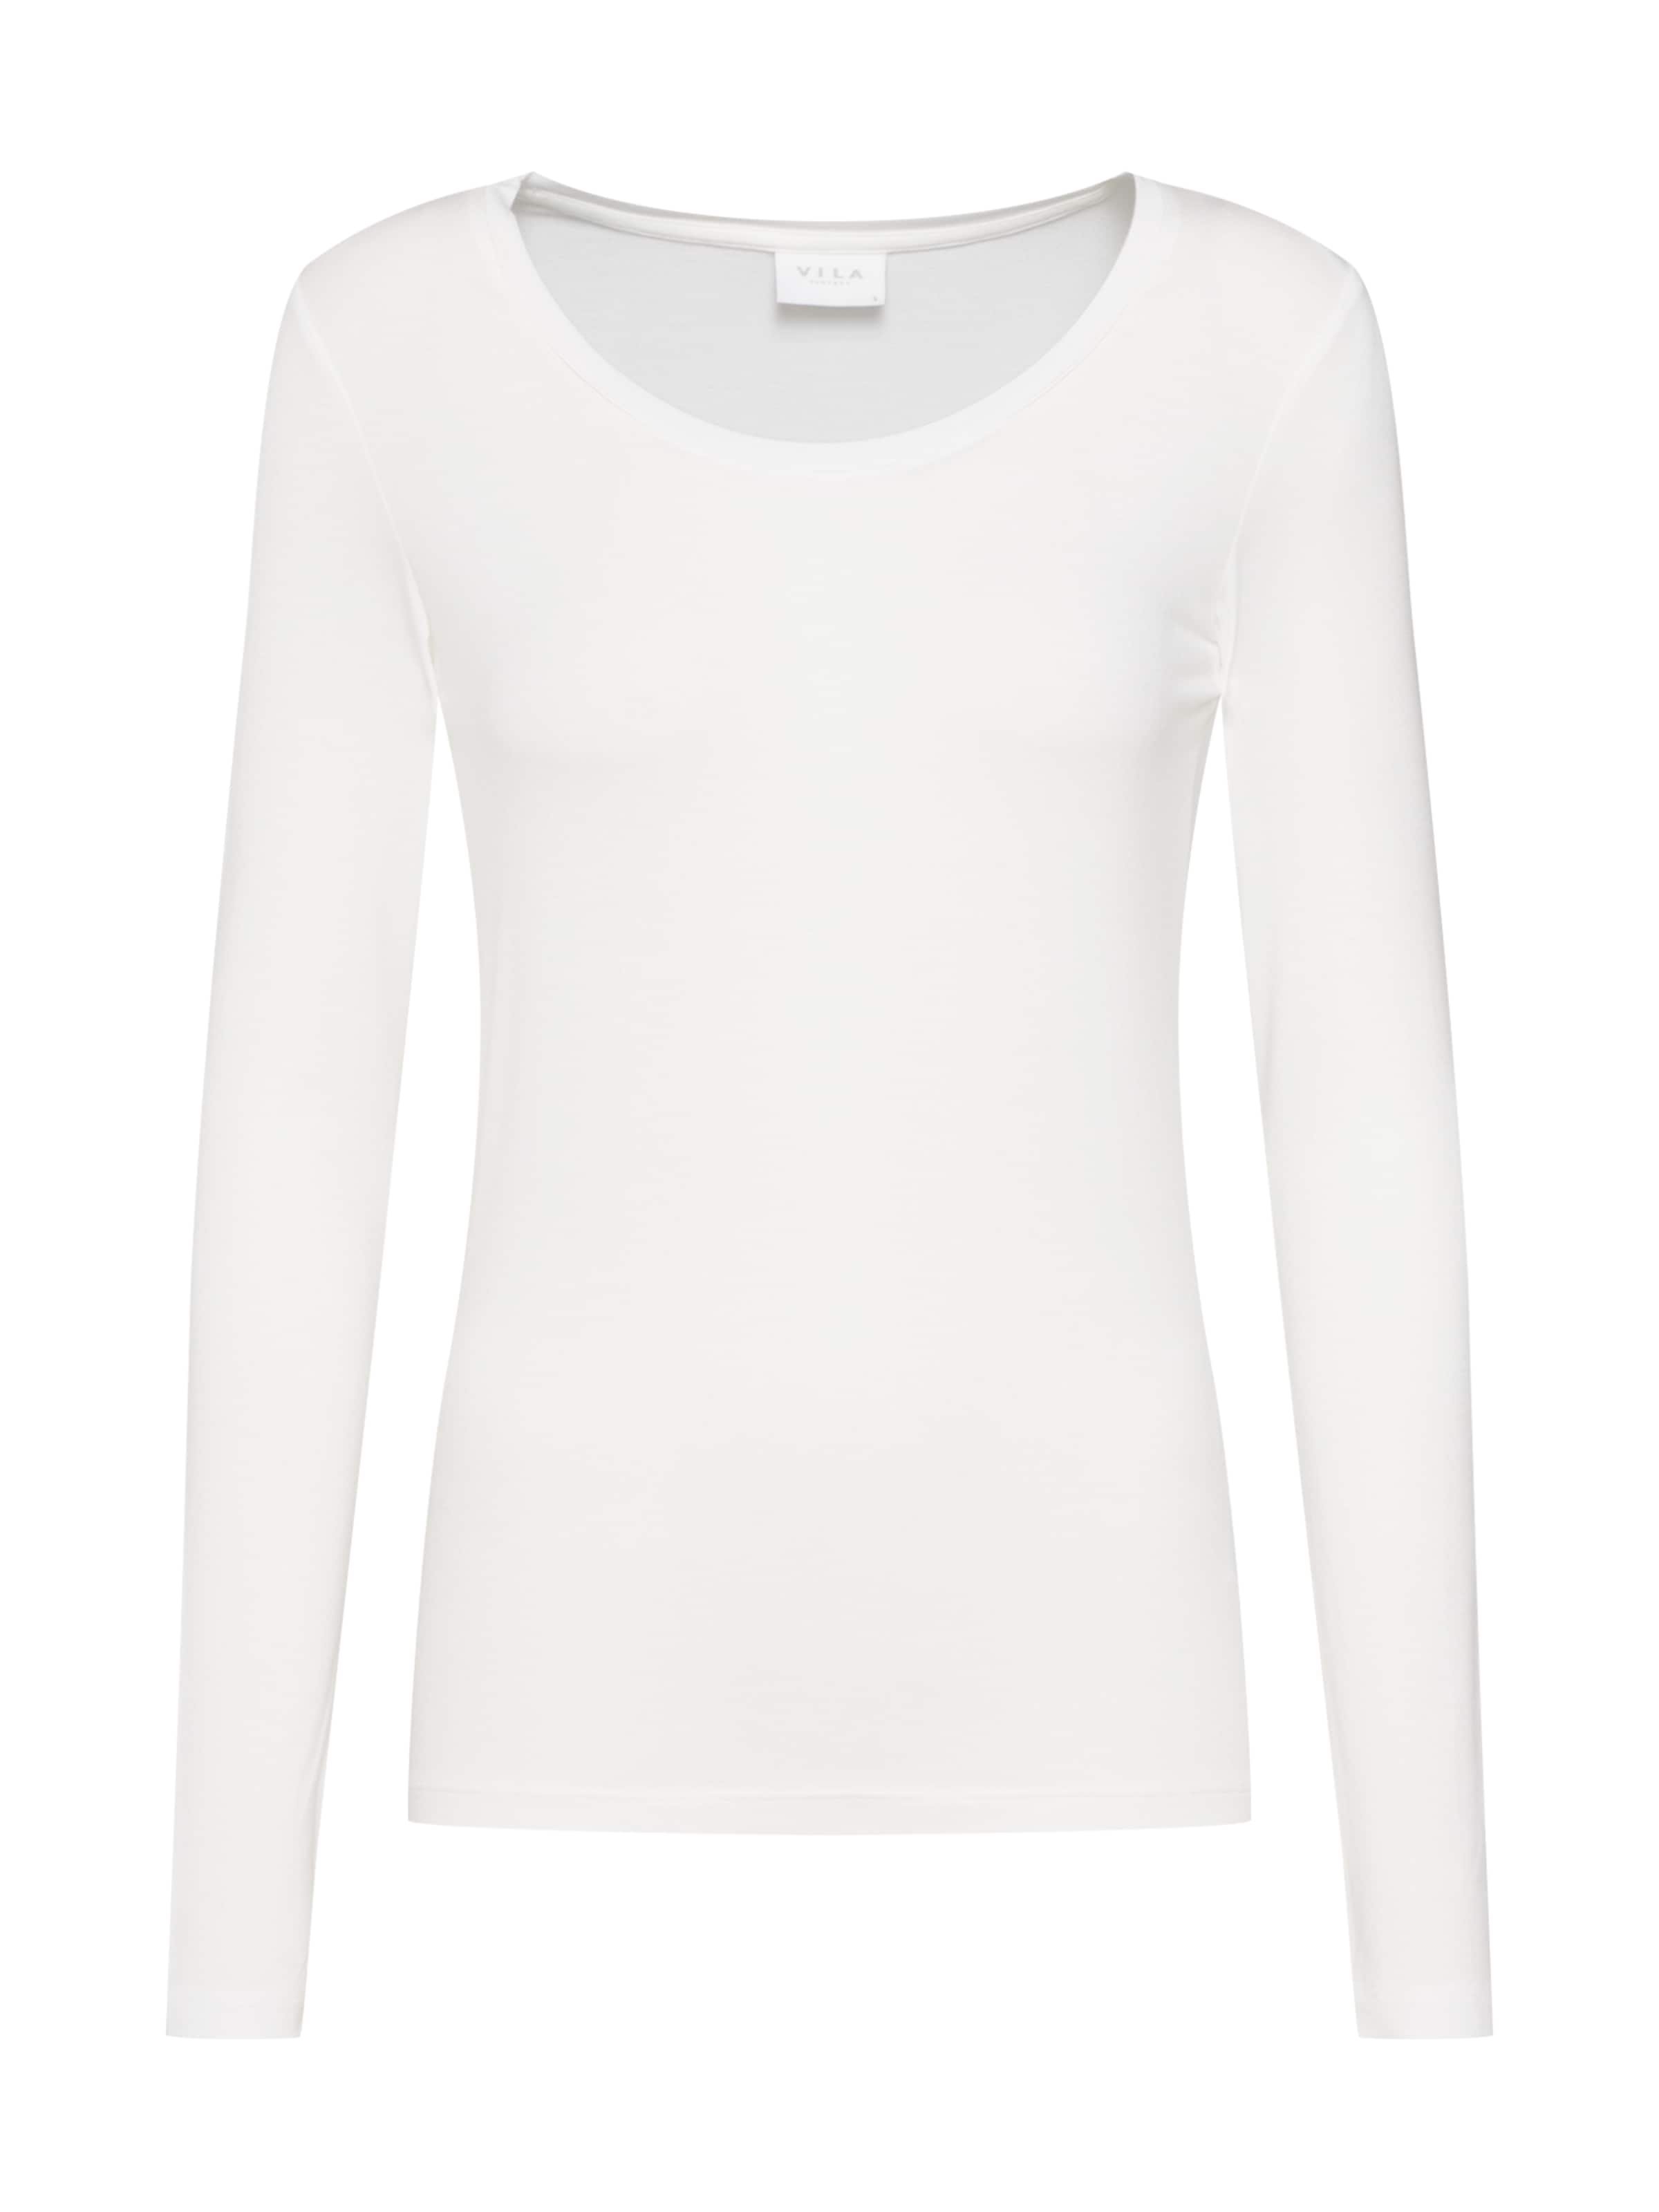 shirt T Blanc En Blanc Vila Vila Vila shirt shirt T En T BrxdoeC